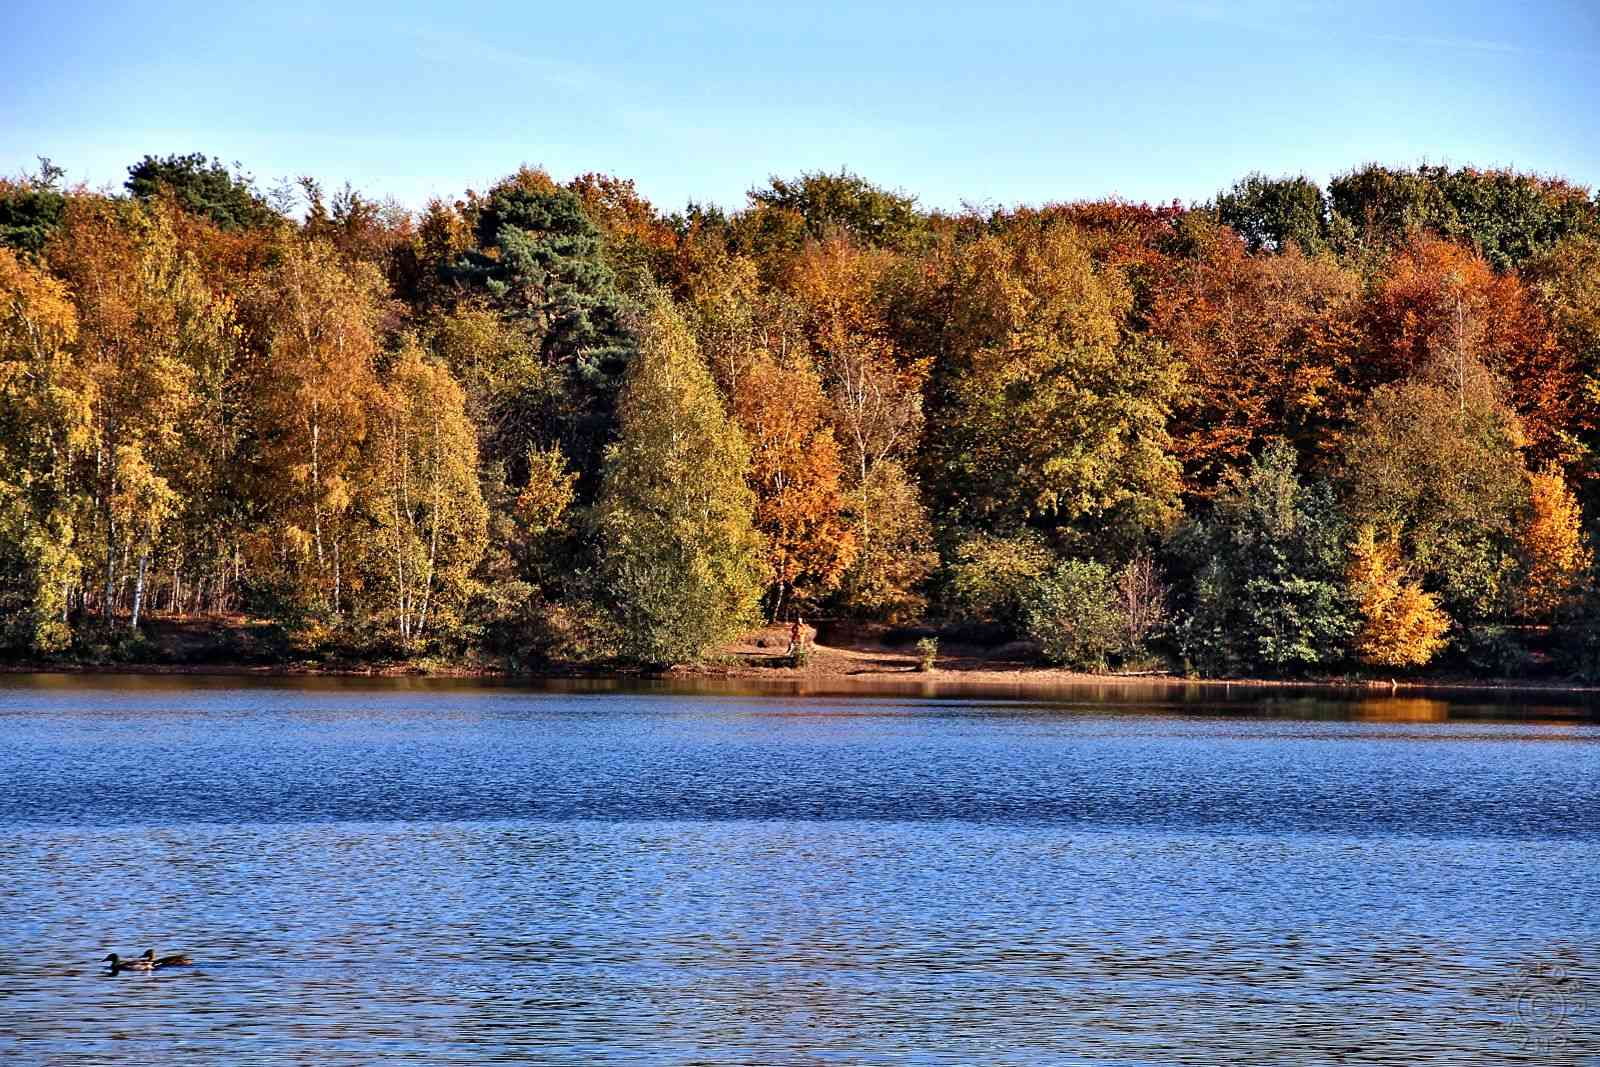 Herbstimpressionen: Sechs Seen Platte 311